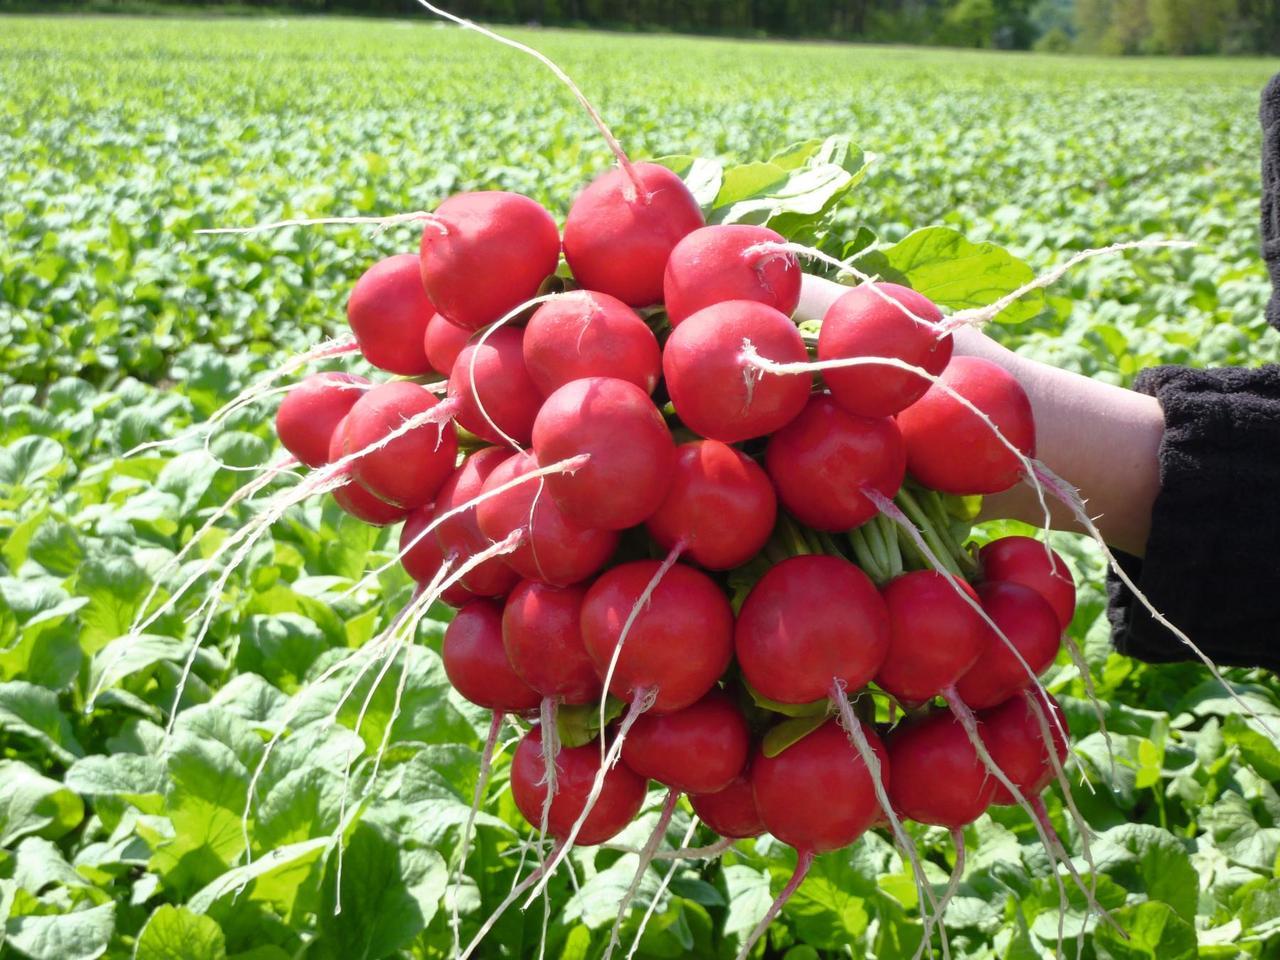 Розетта F1 - семена редиса, Bejo - 5 000 семян 2.75-3.00